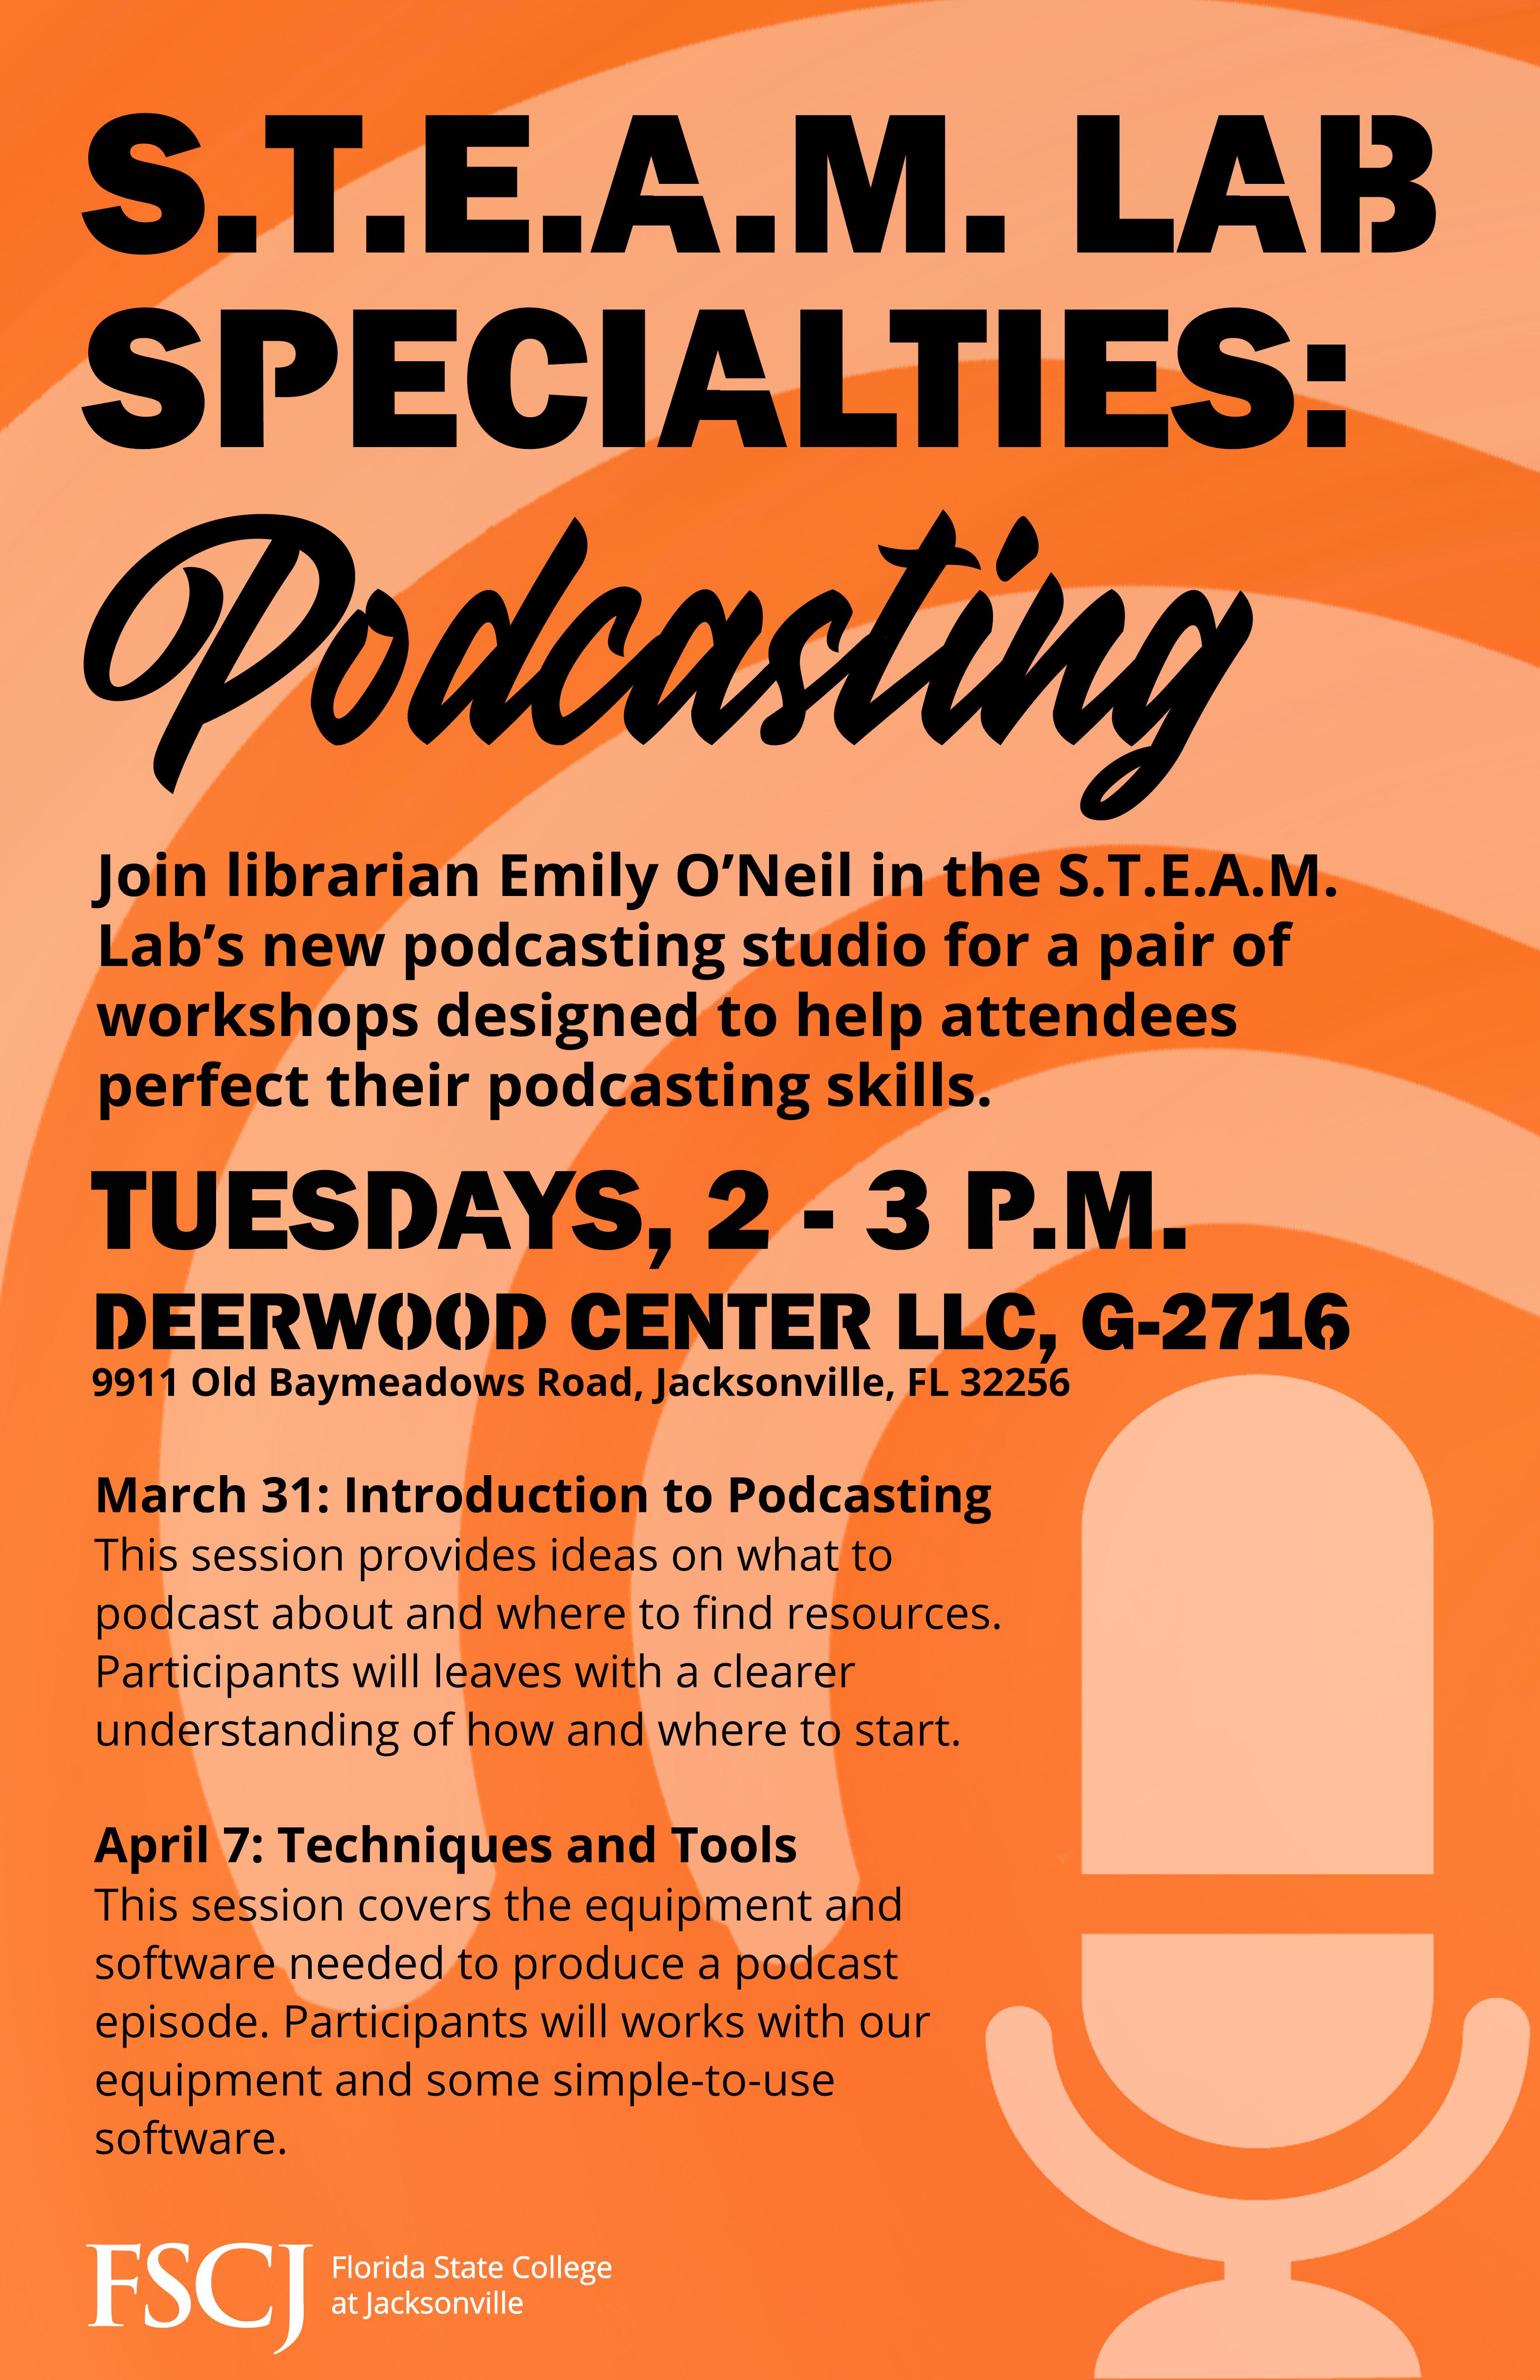 DWC STEAM Lab Specialties: Podcasting